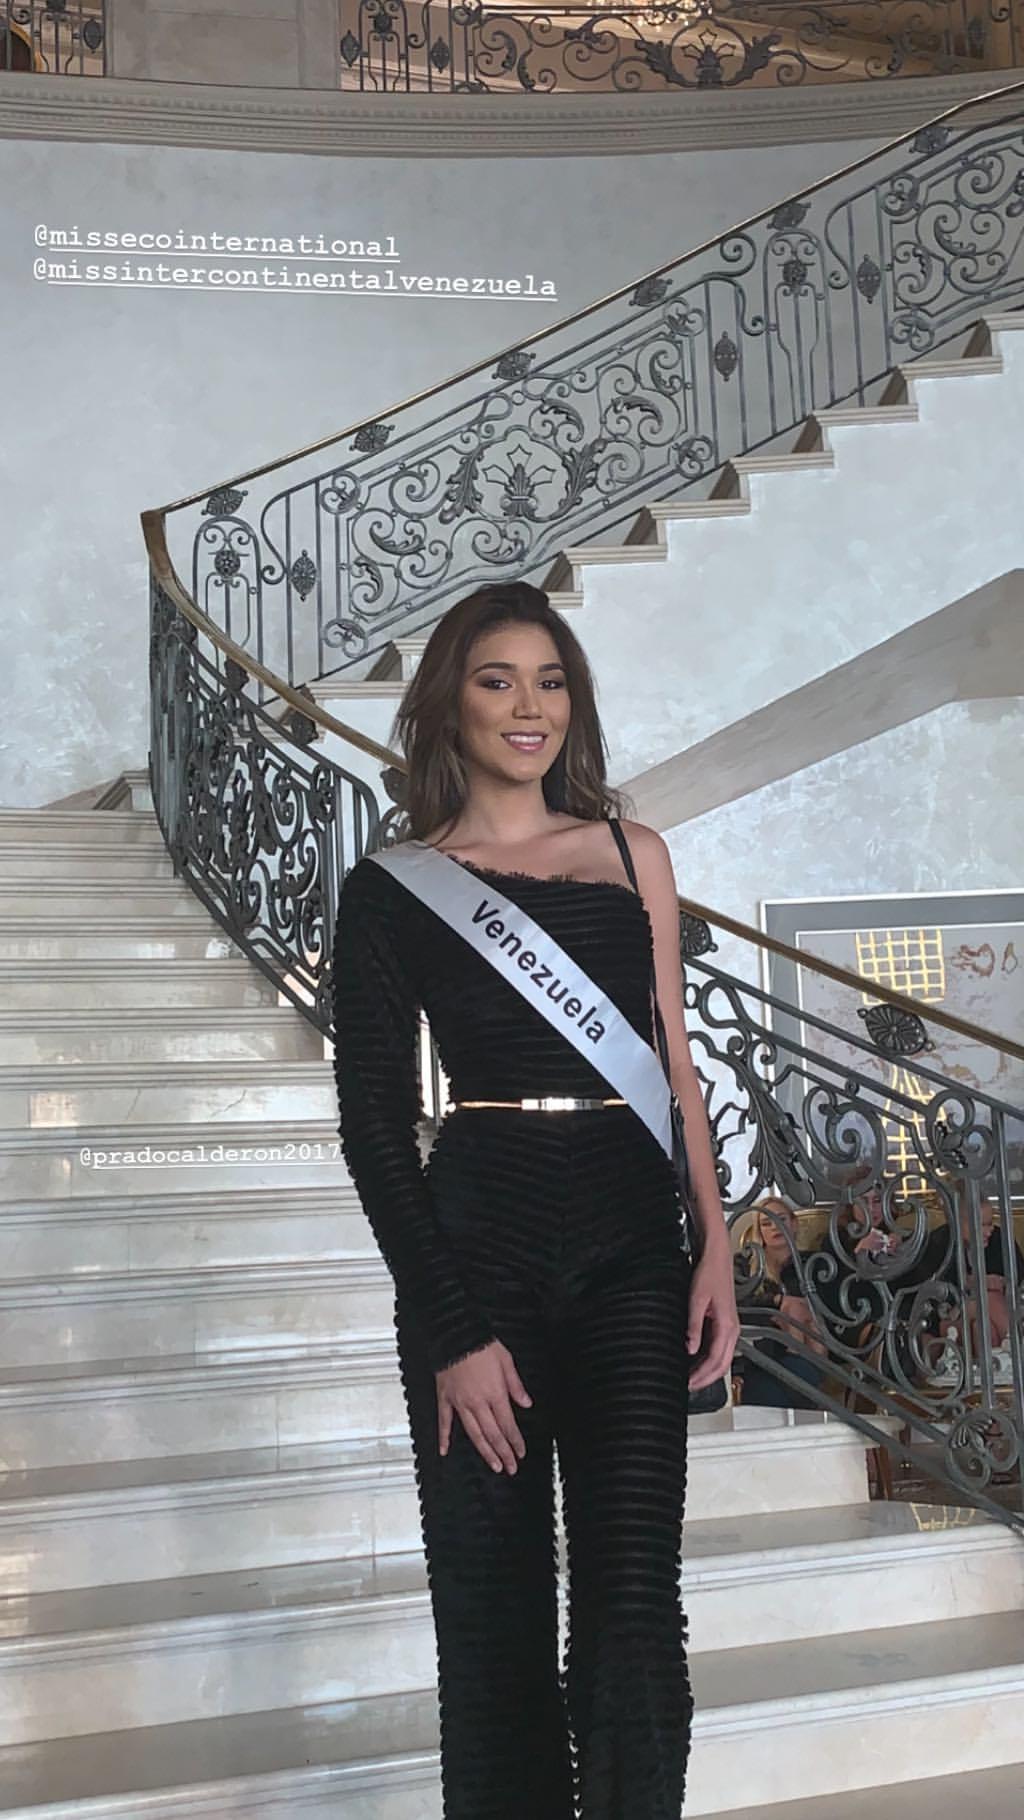 yara d'leon, semifinalista de miss eco international 2019. - Página 3 54732410